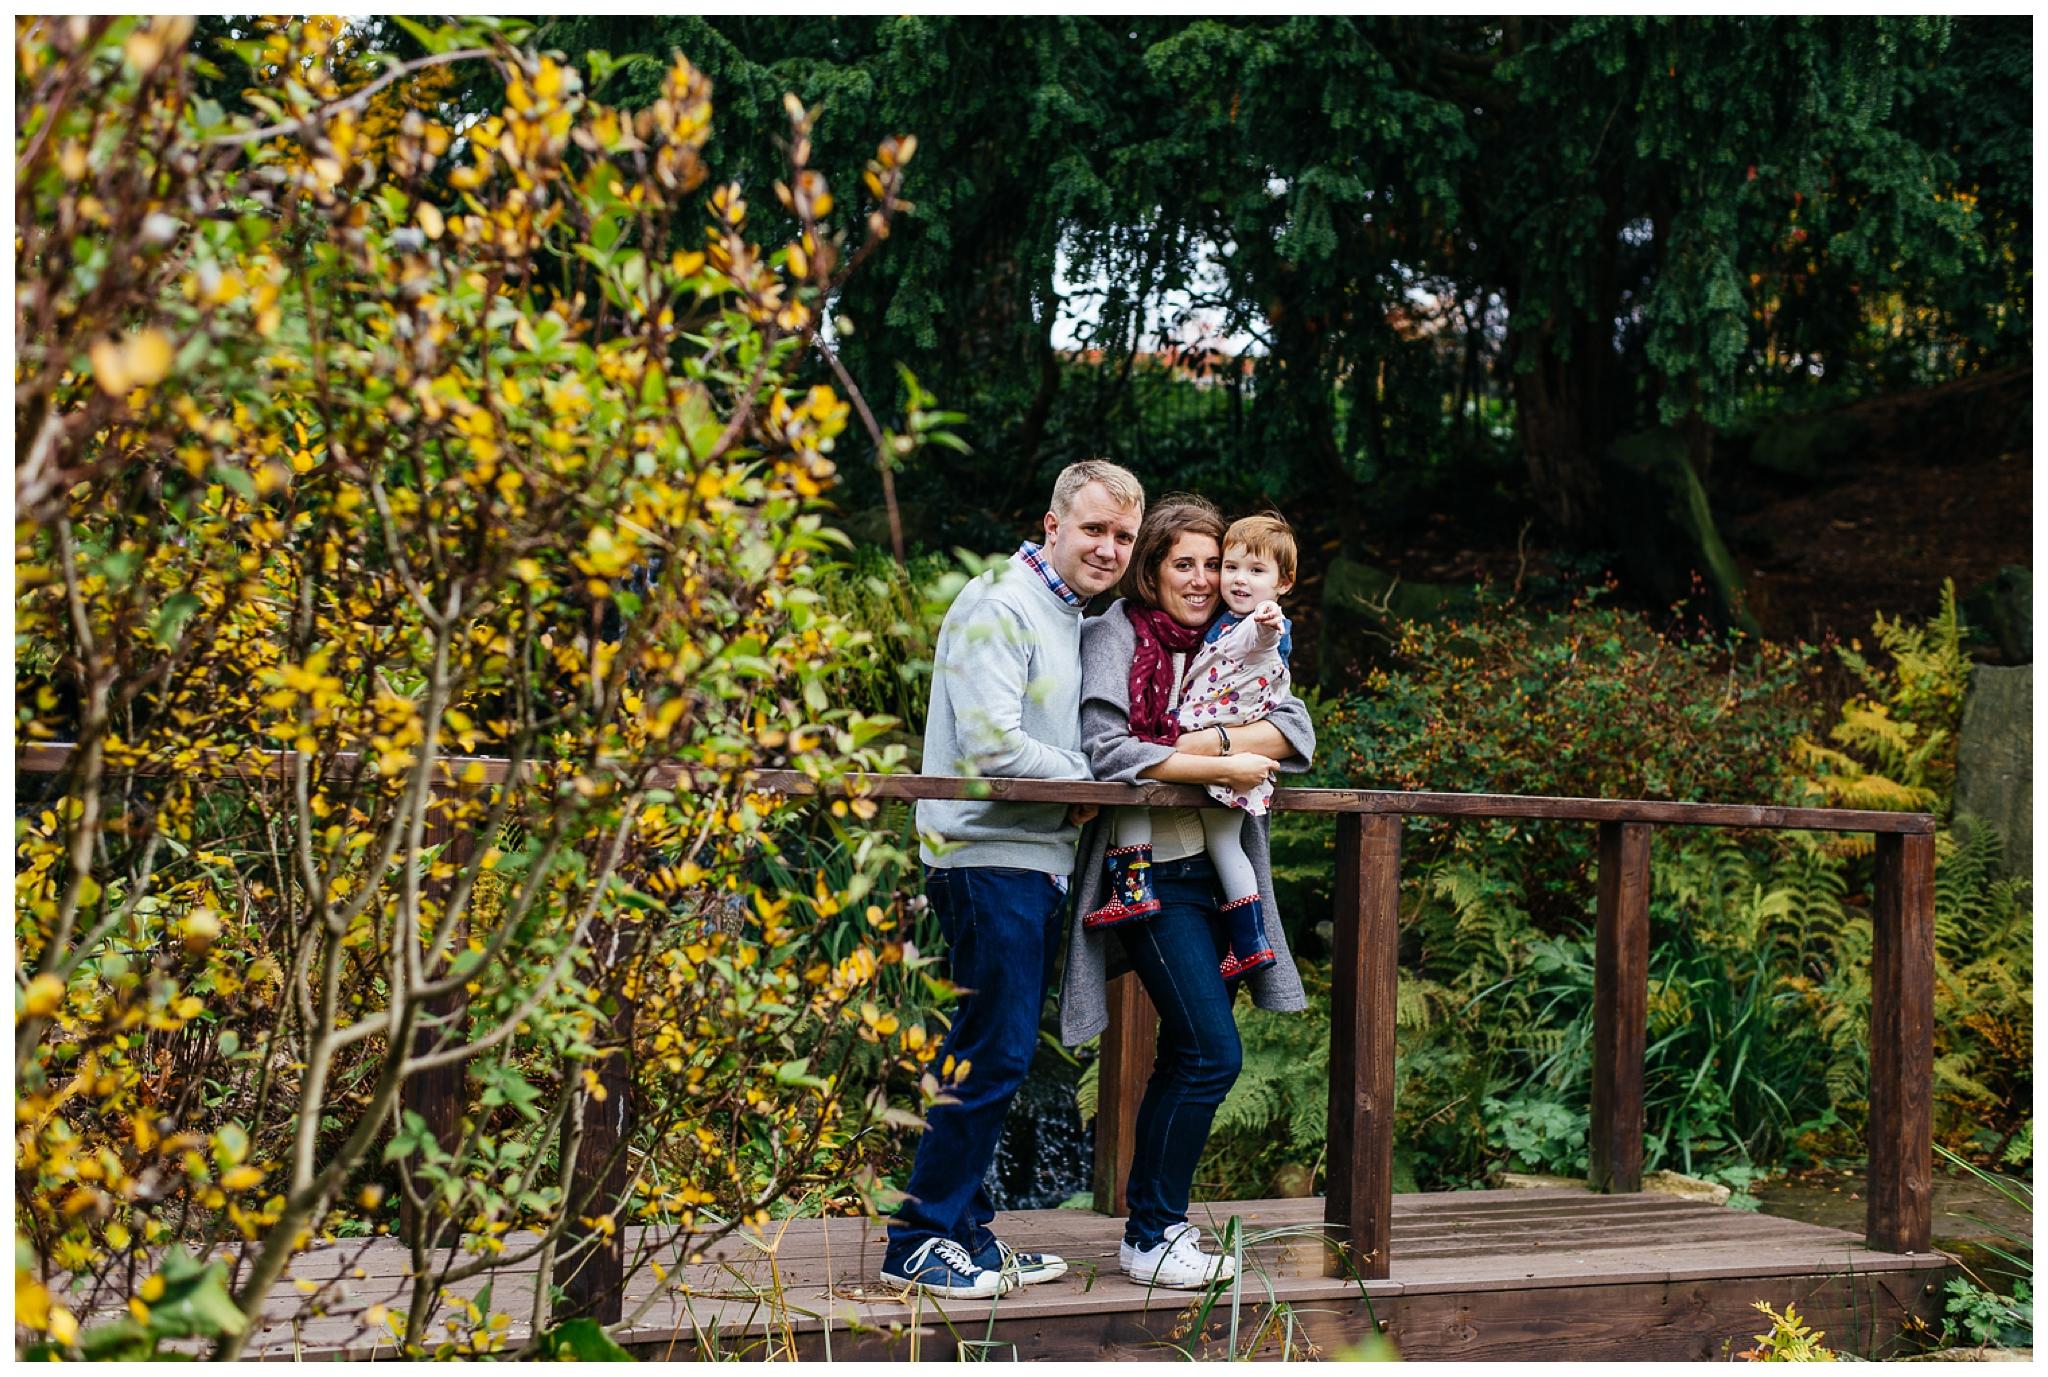 Autumn-family-portraits-birmingham-photographer_0041.jpg